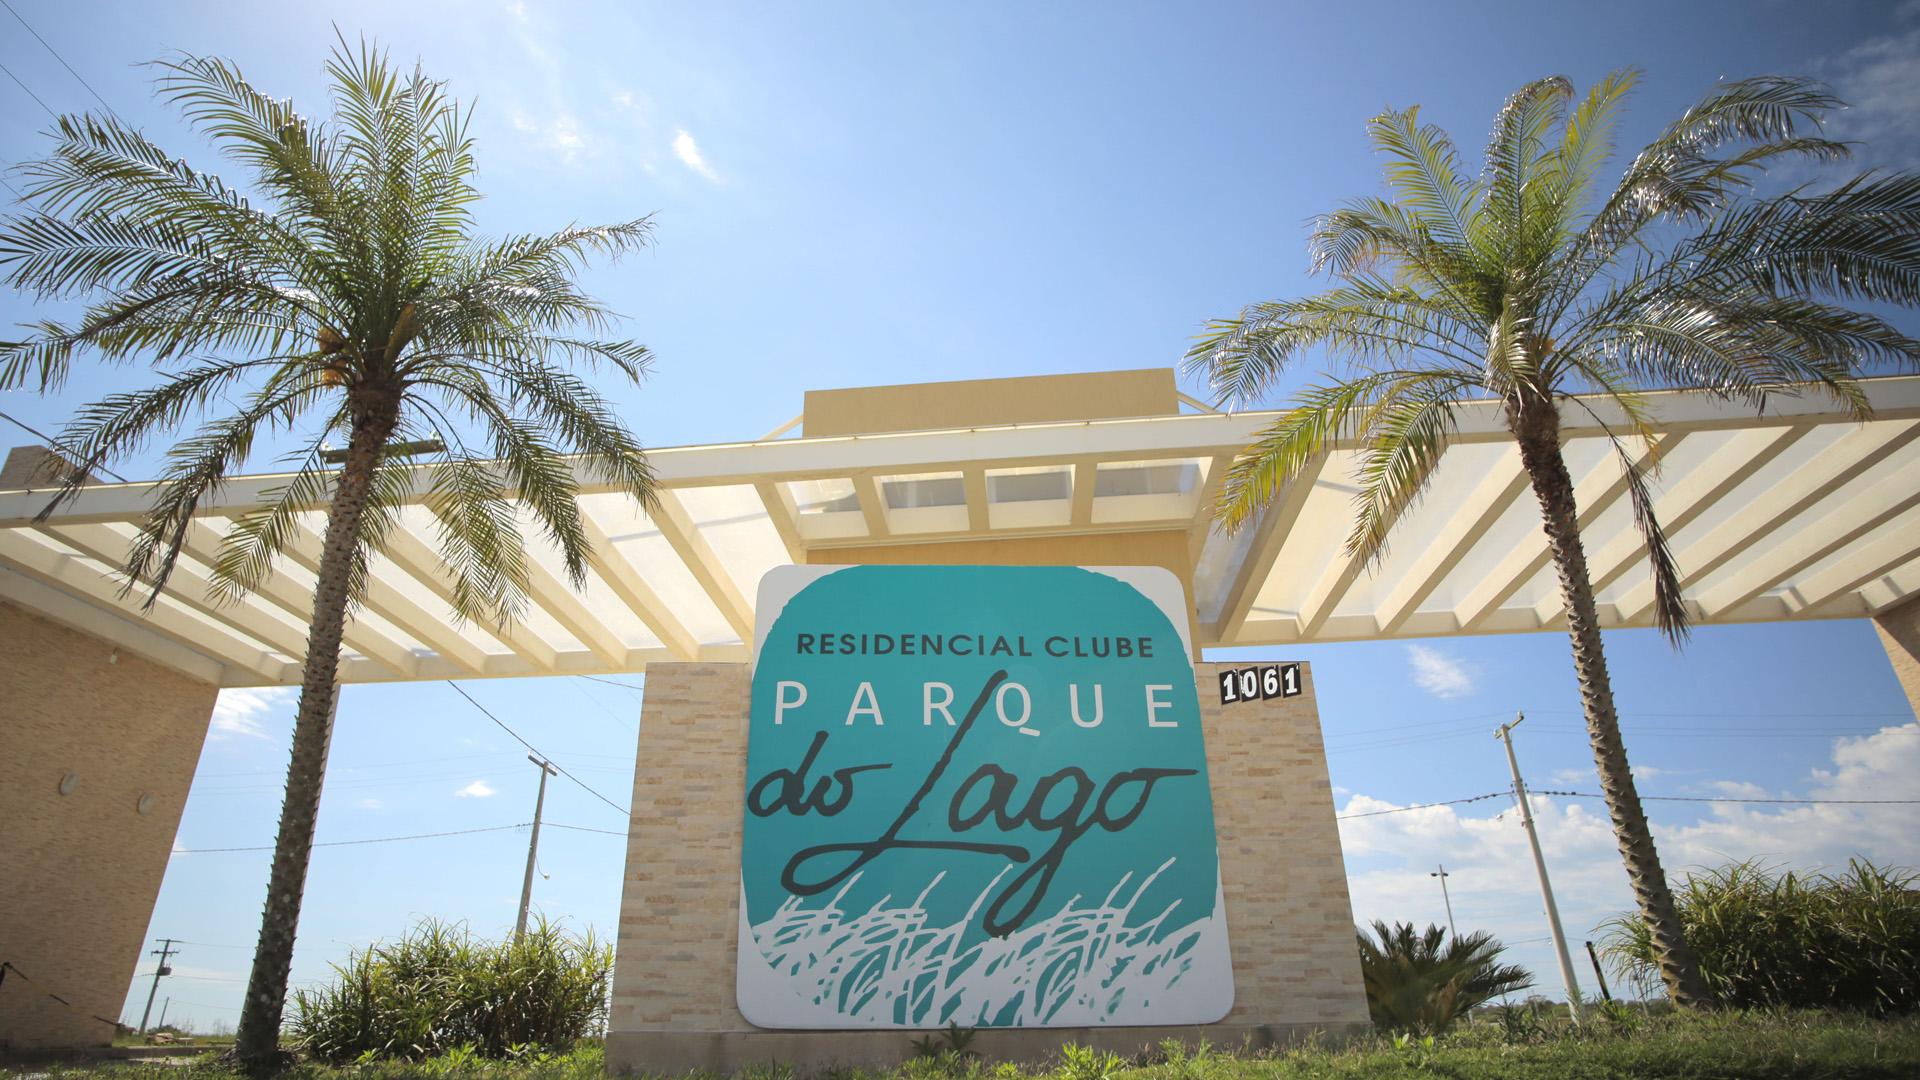 Portaria Parque do Lago - Cassino, Rio Grande - Marcos Otero